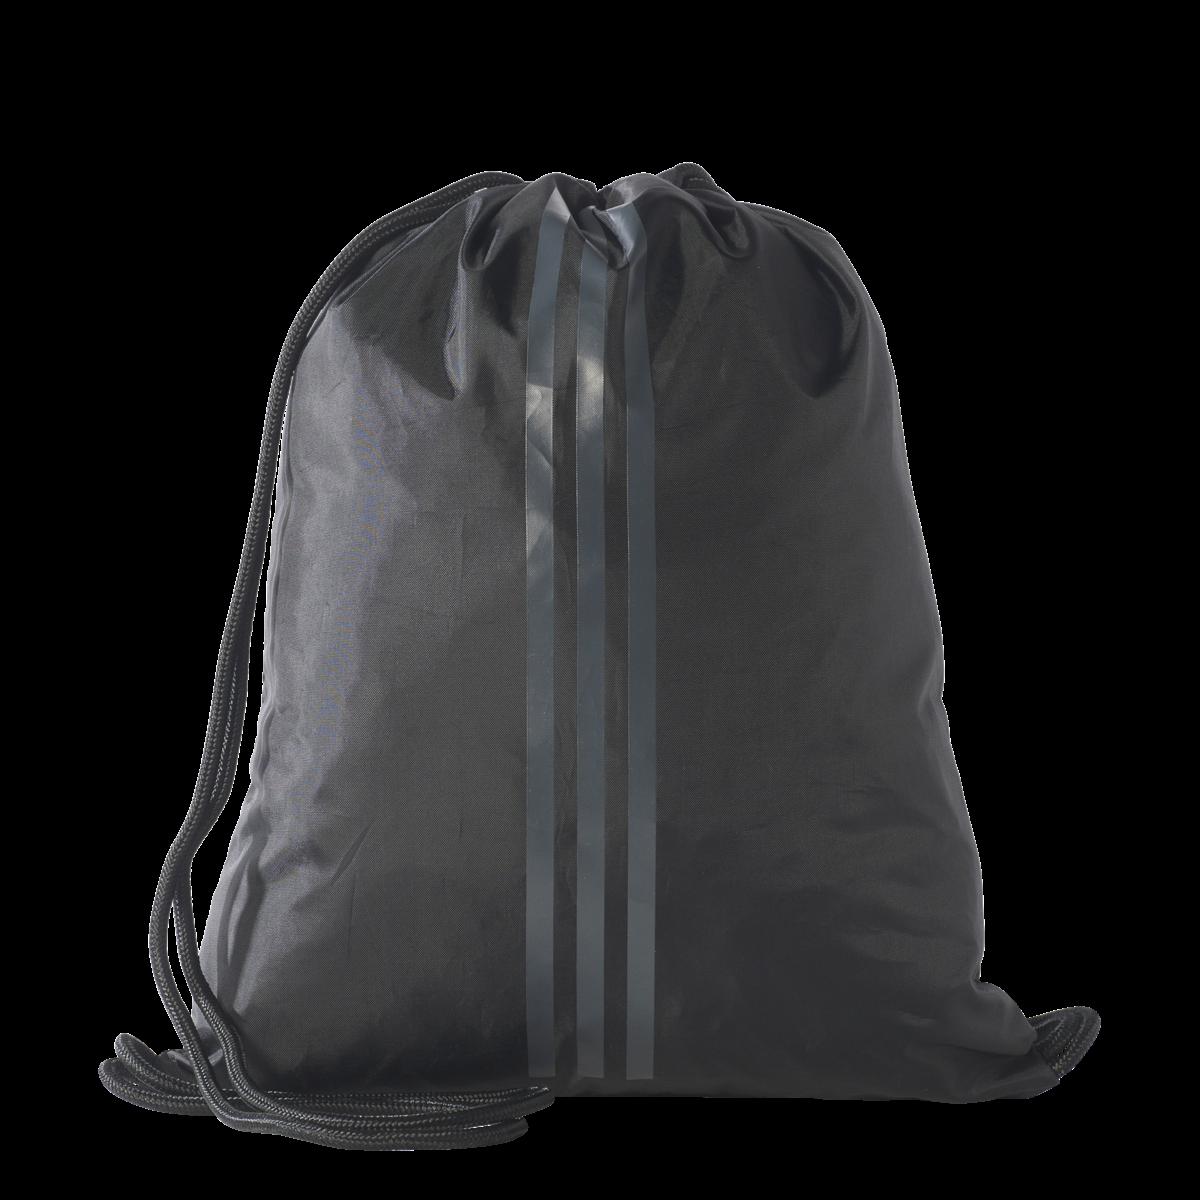 c6255b058597 Plecak VANS Realm Backpack - VN0A3UI6BLK + Worek Torba Adidas Tiro ...